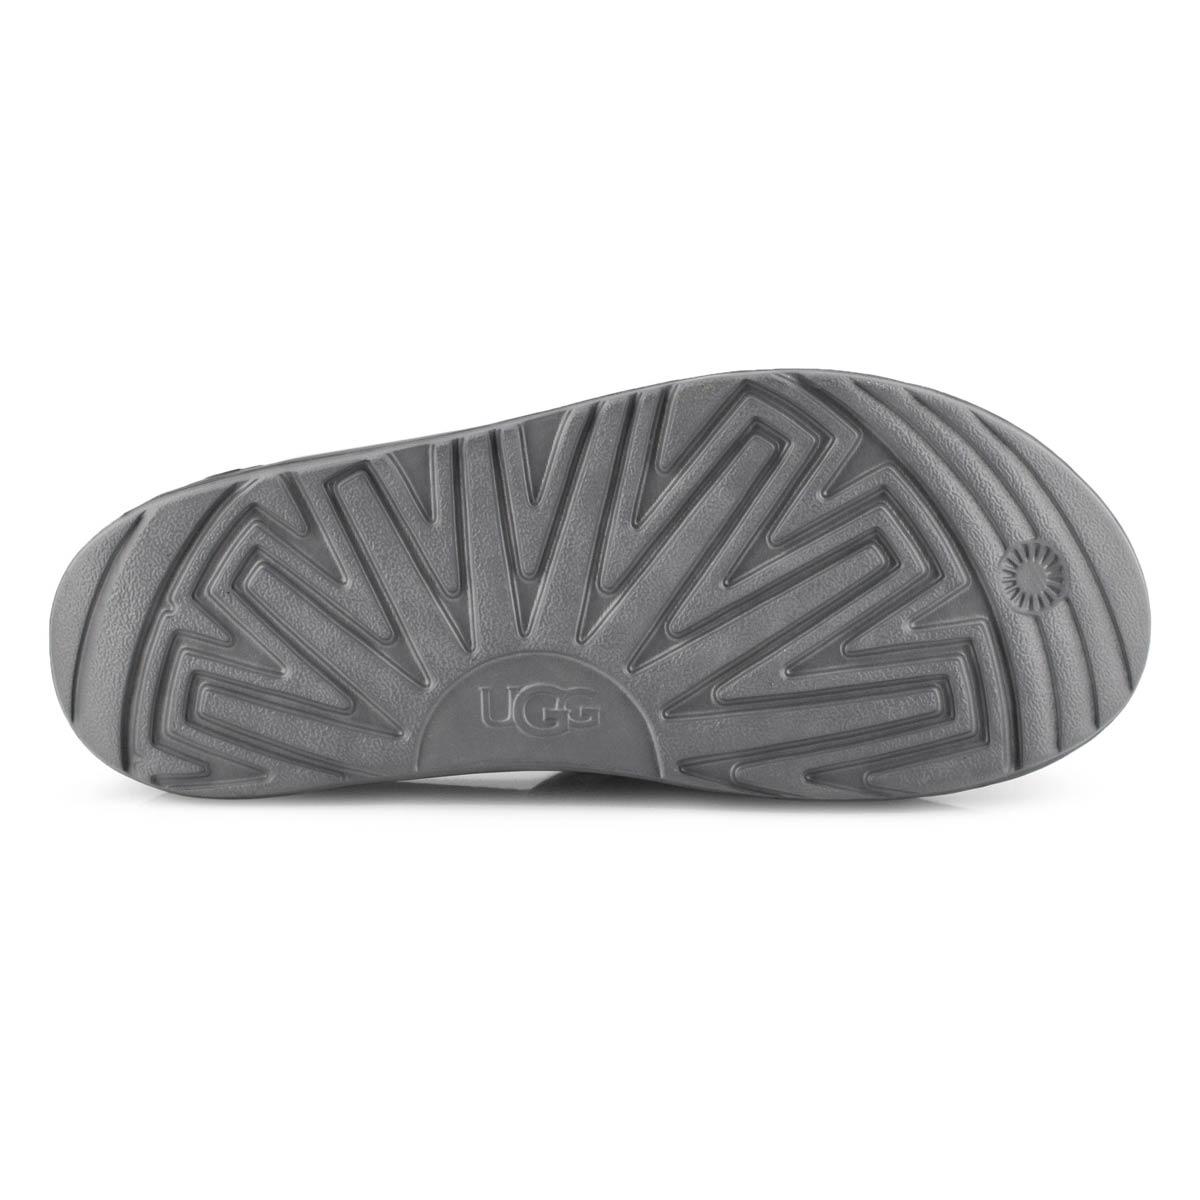 Mns Wilcox black slide sandal